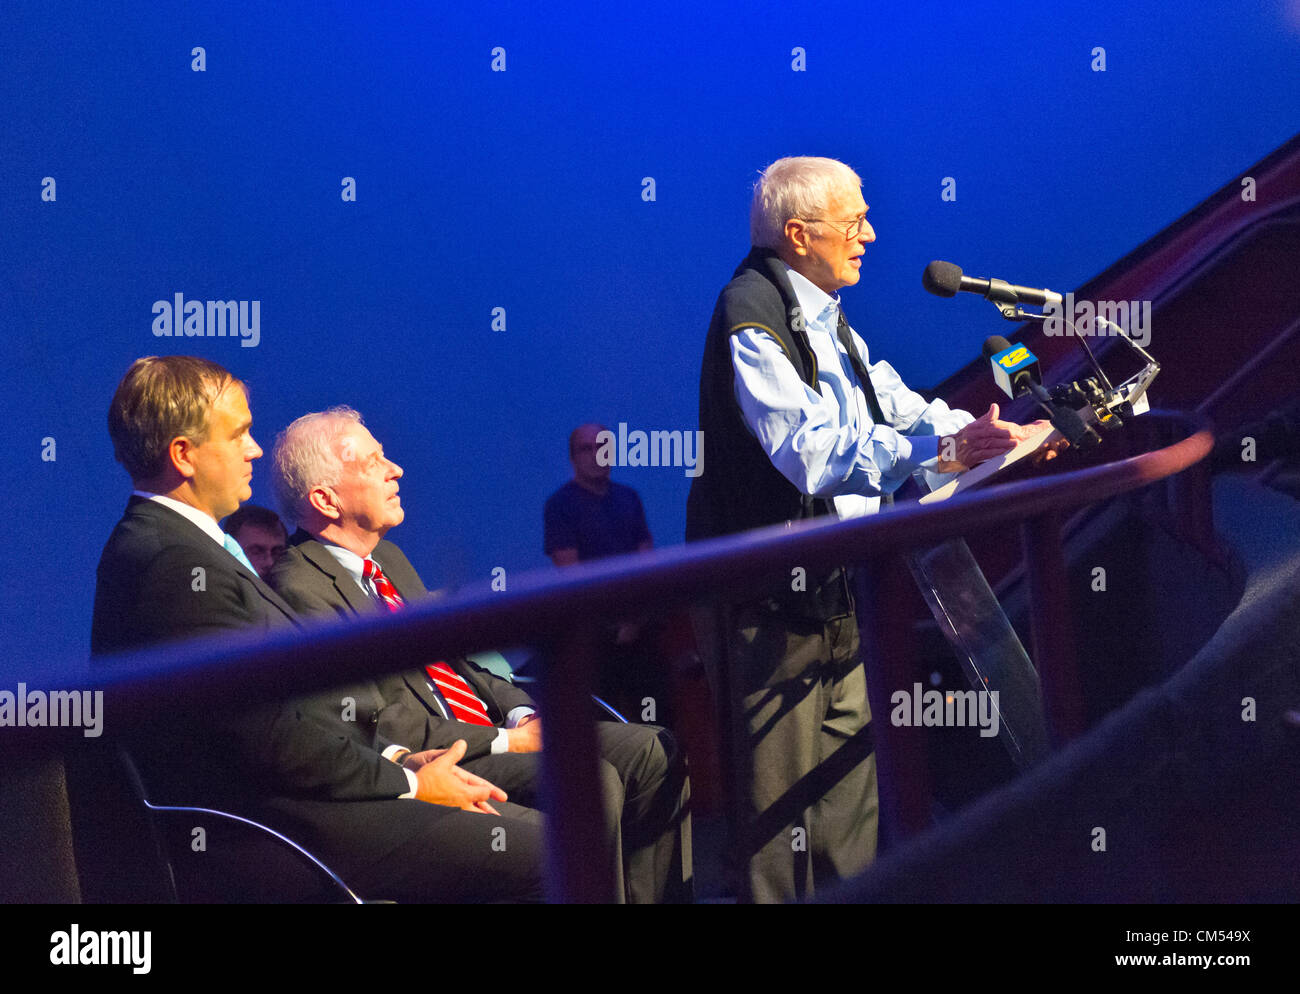 Oct 4, 2012 - GARDEN CITY, NEW YORK U.S. - (L - R) ROBIN HAYES, JetBlue EVP; NY State Senator KEMP HANNON; and, - Stock Image